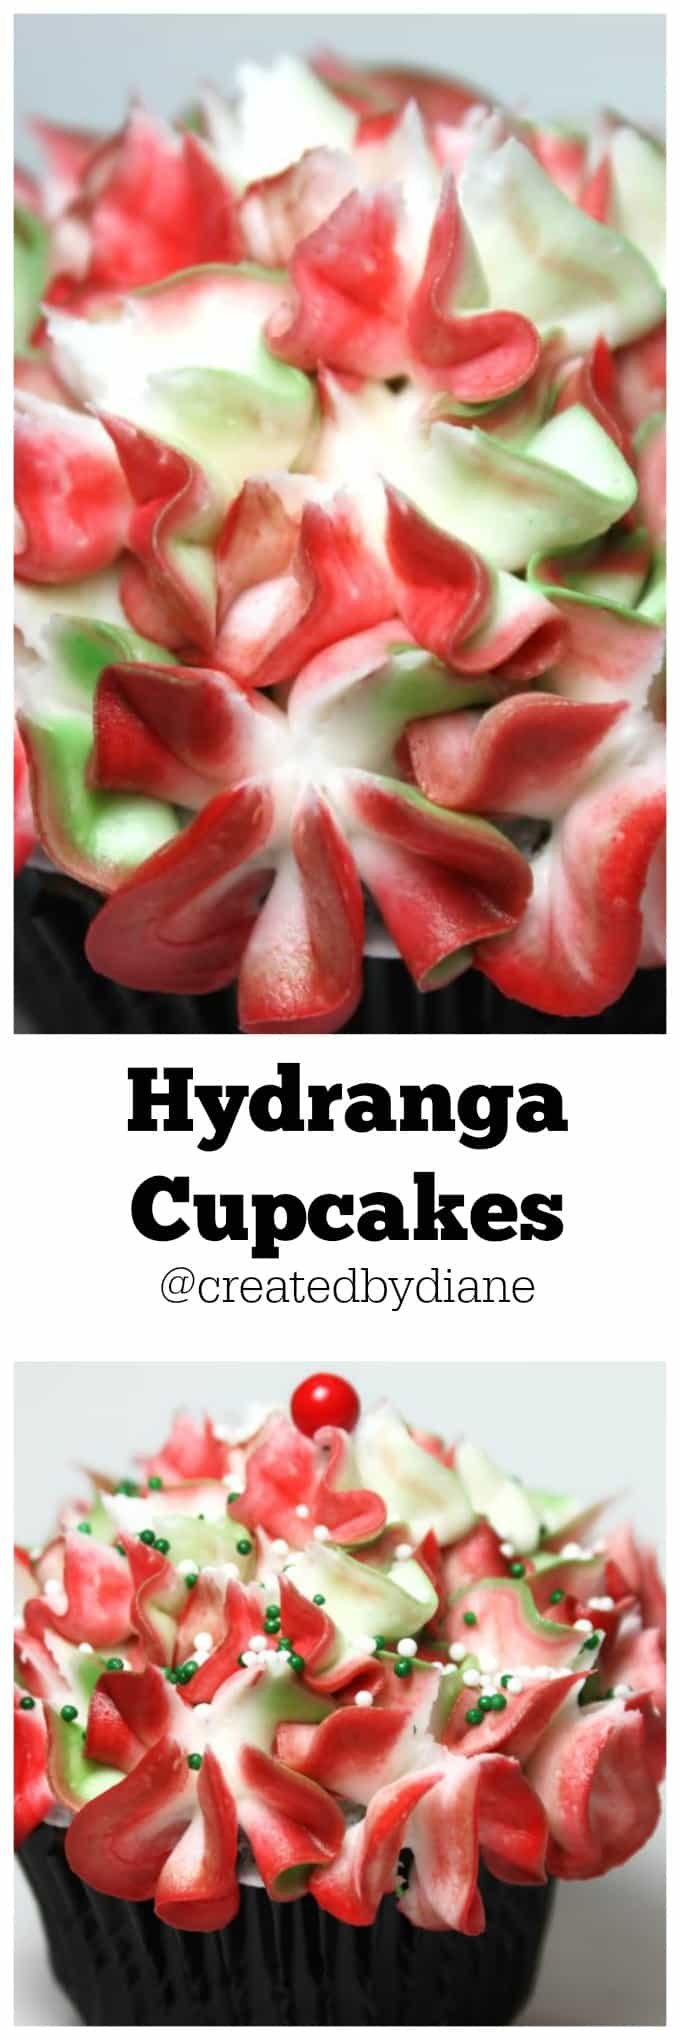 Hydranga cupcakes @createdbydiane